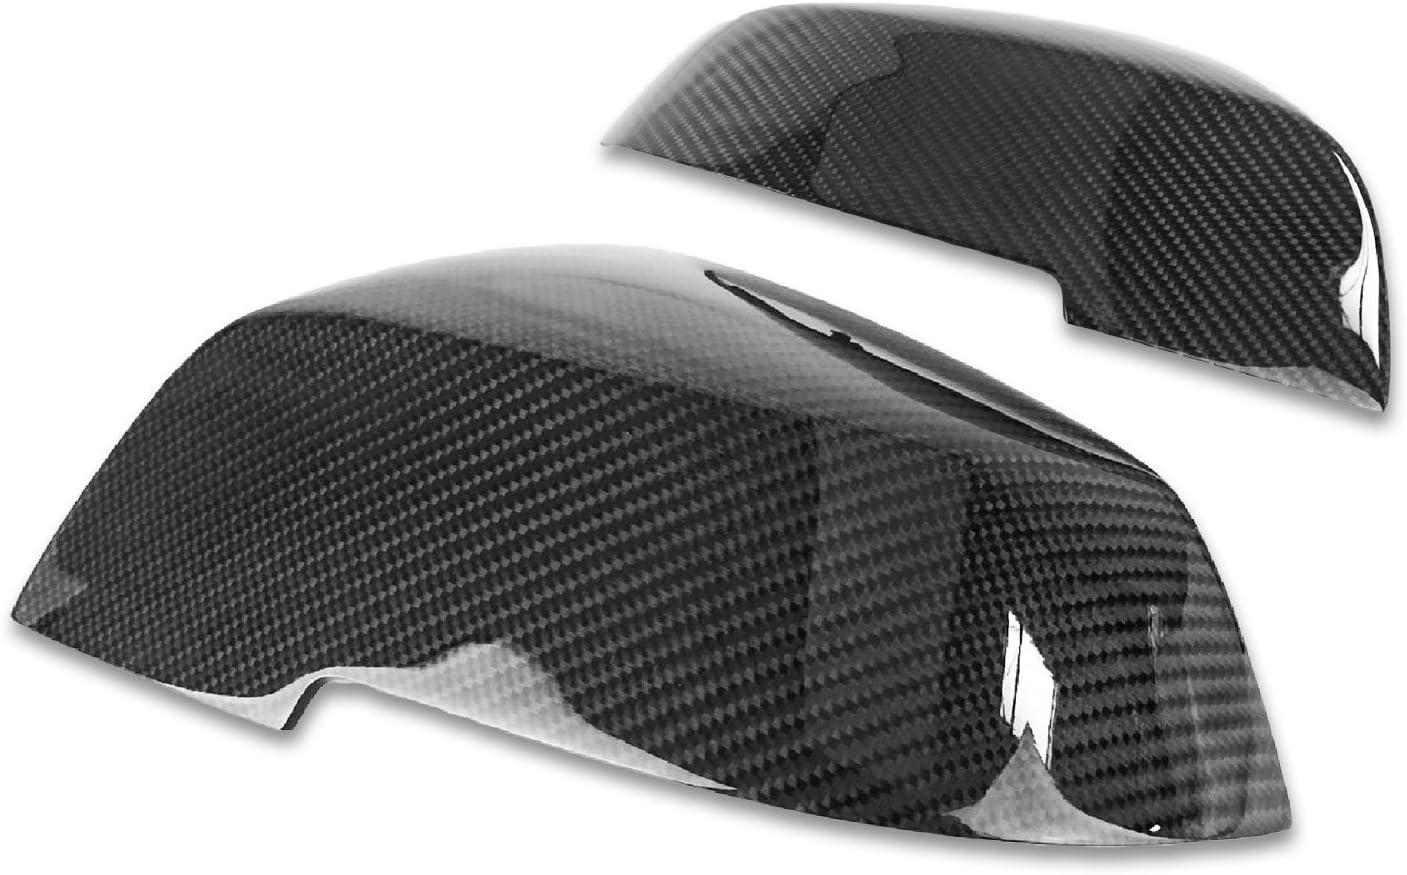 2Pcs Carbon Fiber M Style Mirror Cover Cap Fr BMW F20 F30 F35 F36 1 2 3 4 Series